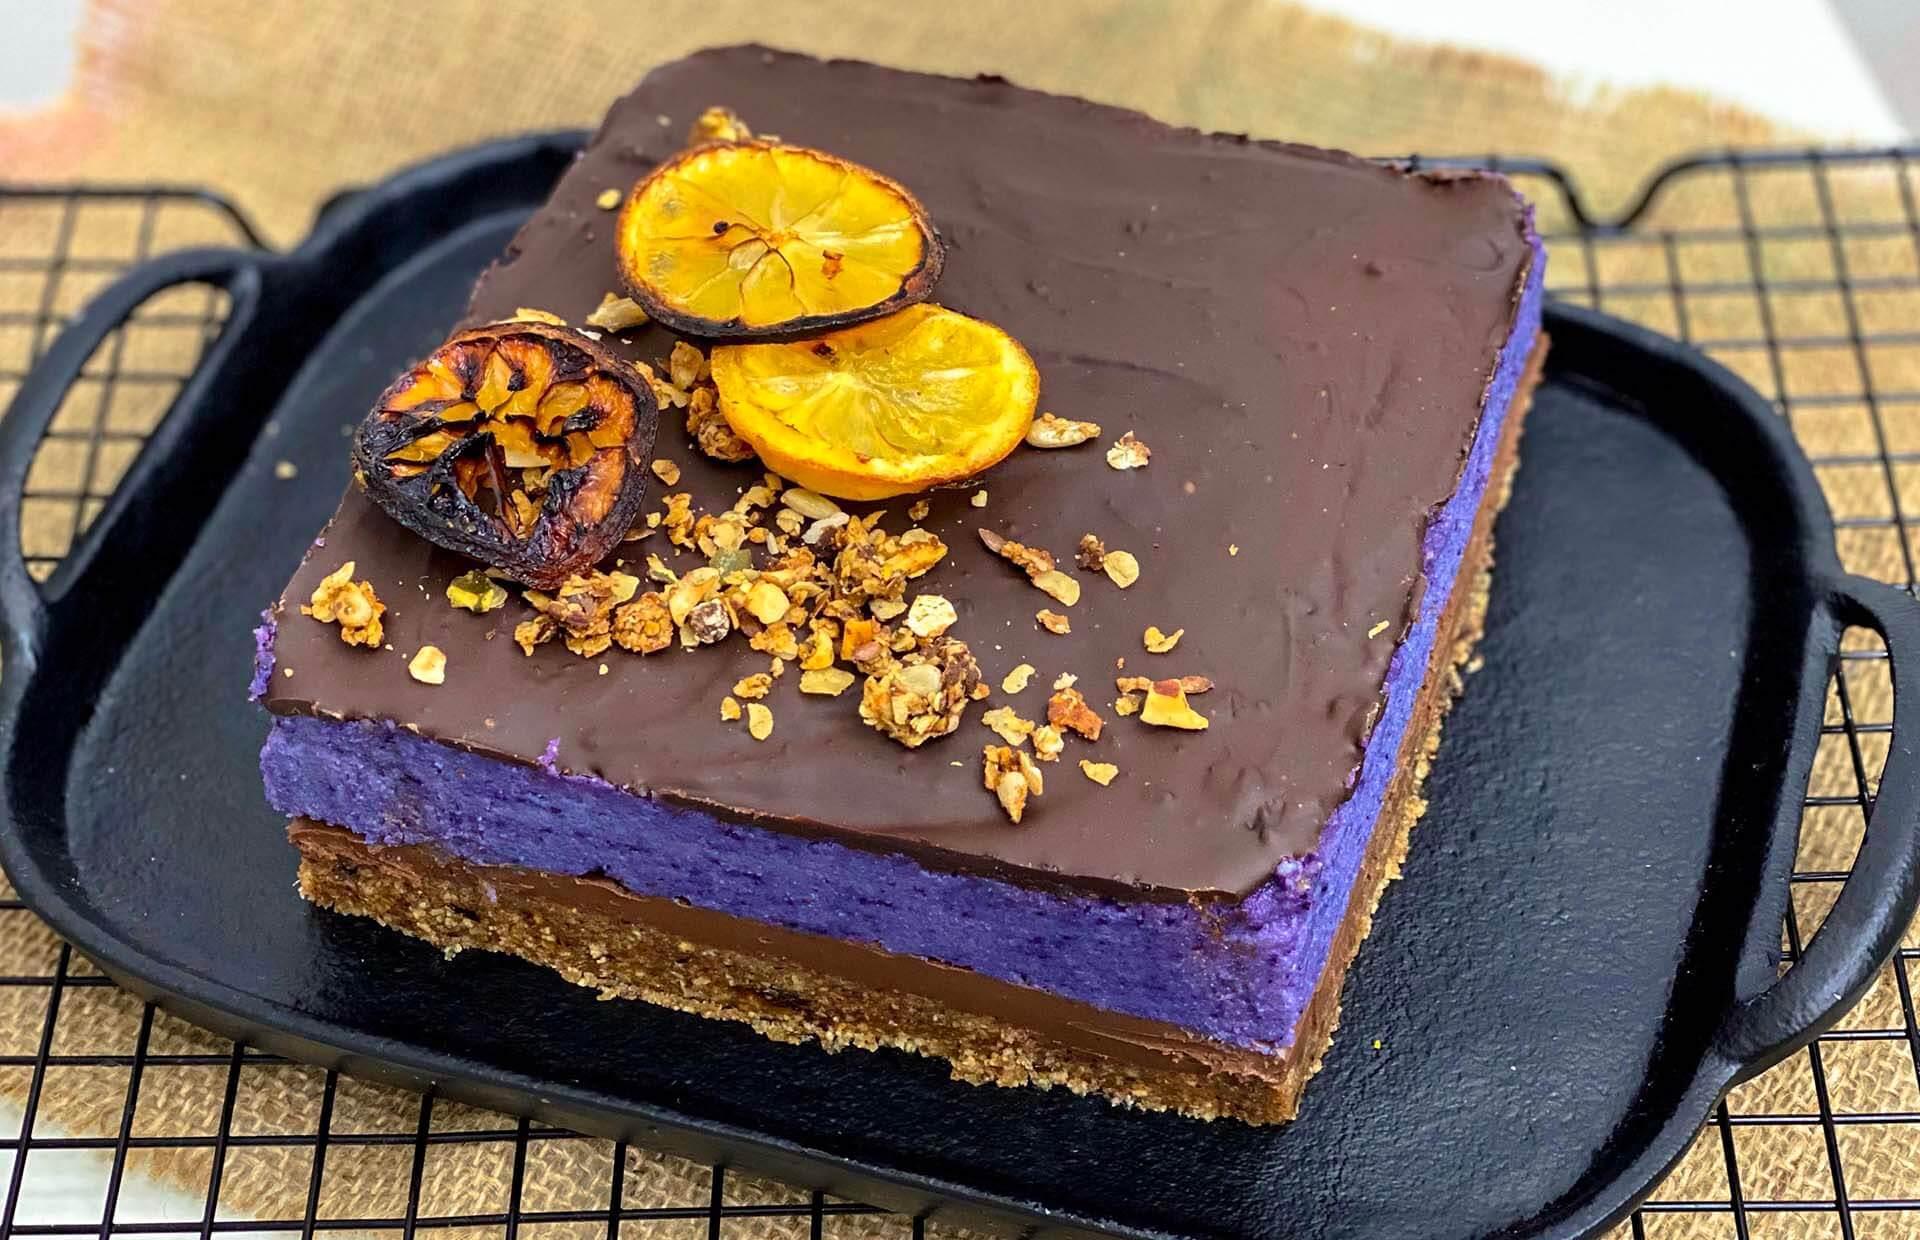 čokoladna torta, klub zdravih navika, kan, čokoladna torta klub zdravih navika, čokoladna torta kzn, čokoladna torta sa borovnicama, čoko borovnica torta, čoko torta, borovnica torta, ljubičasta torta, urme, limun, slatko, poslastica, desert, čoko desert, Iceberg Salat Centar